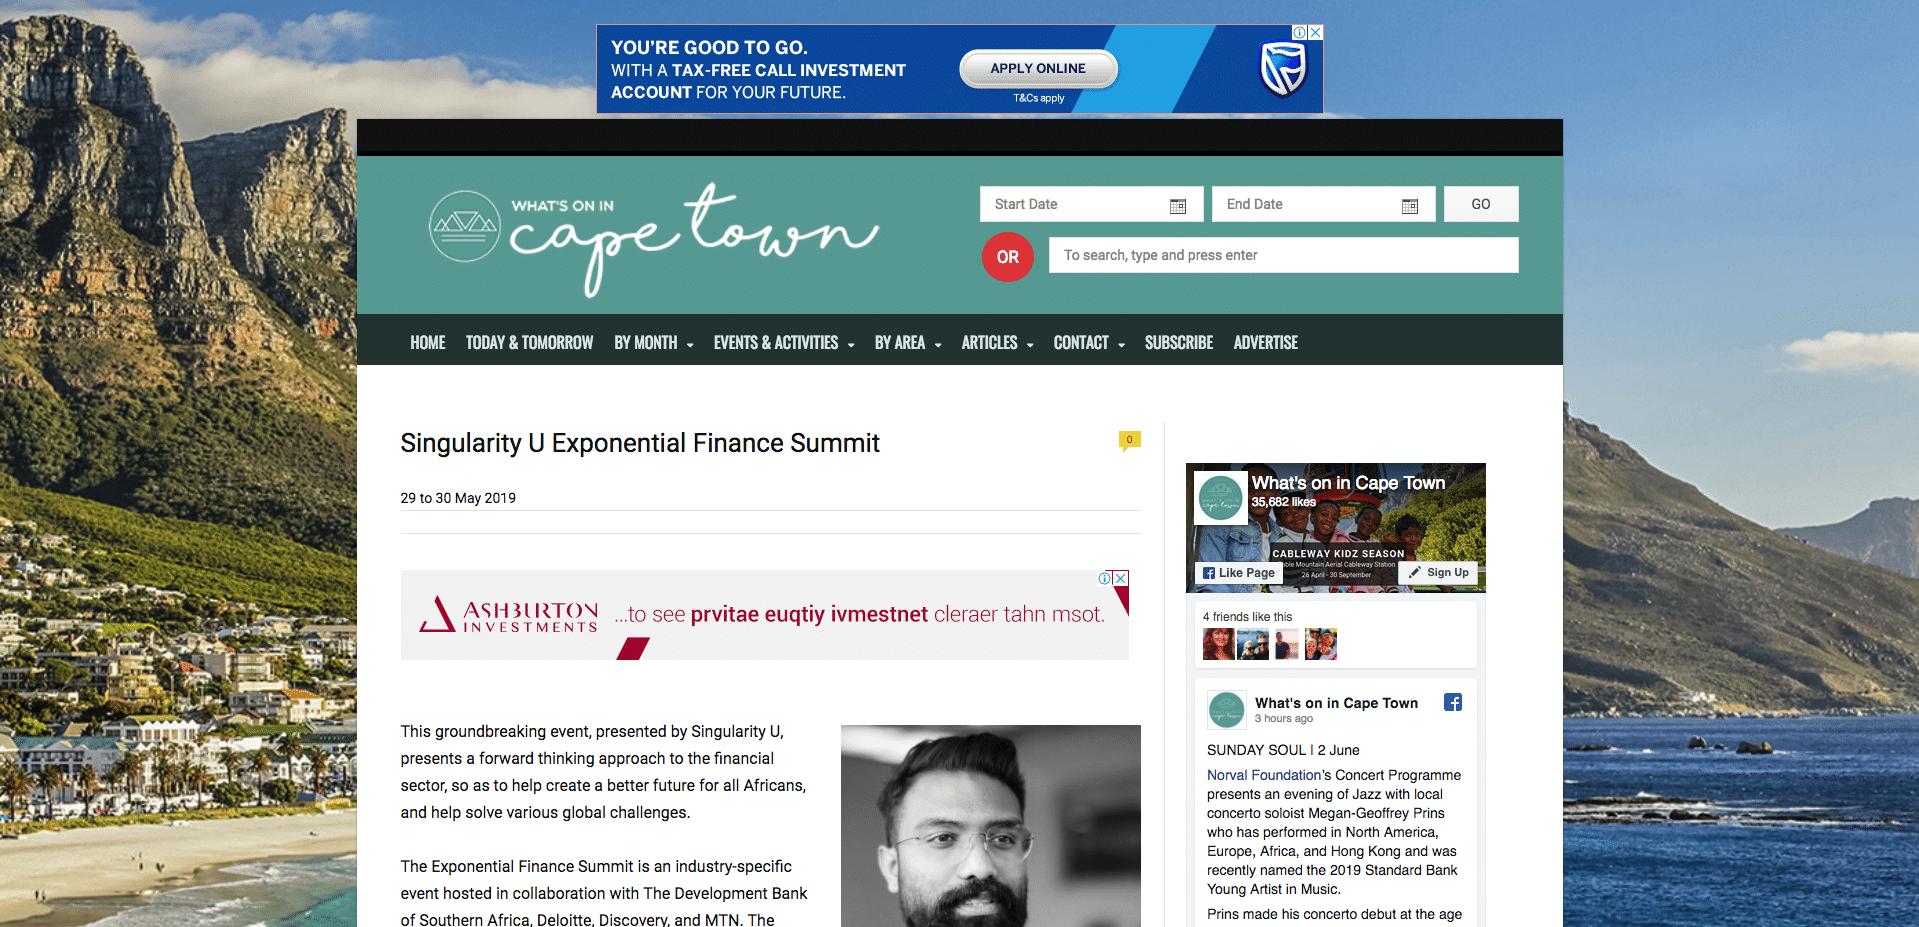 Singularity U Exponential Finance Sum_ - https___www.whatsonincapetown.com_